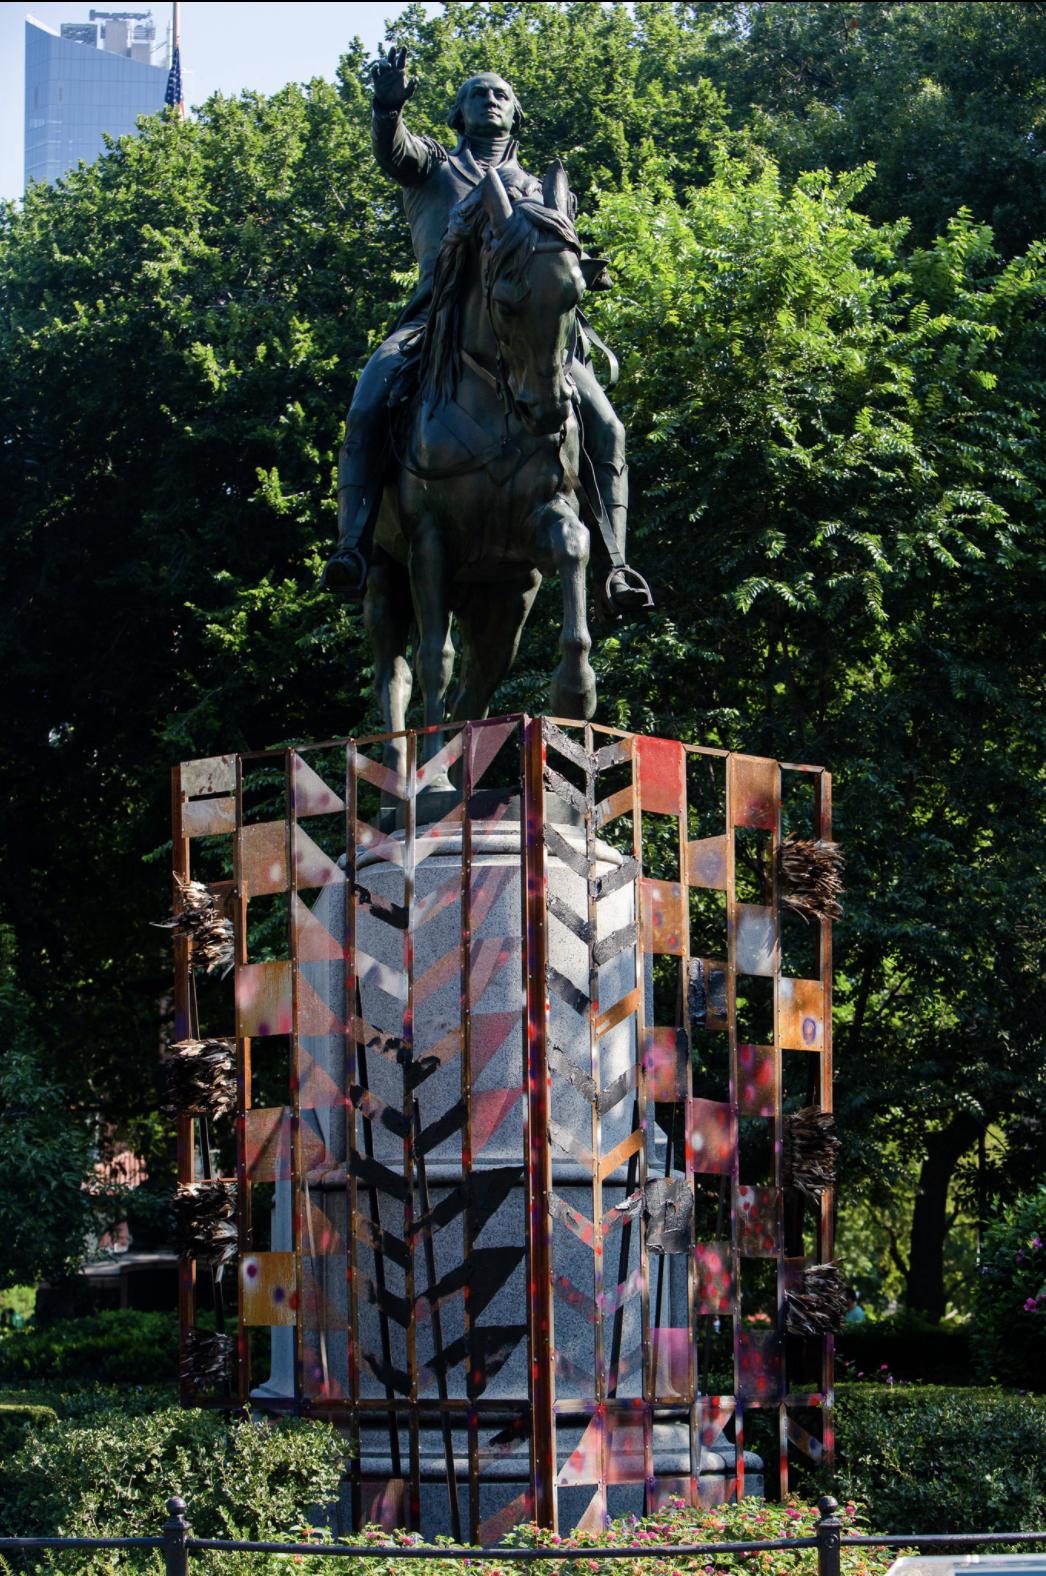 Photograph of Kenseth Armstead's installation, Washington 20/20/20